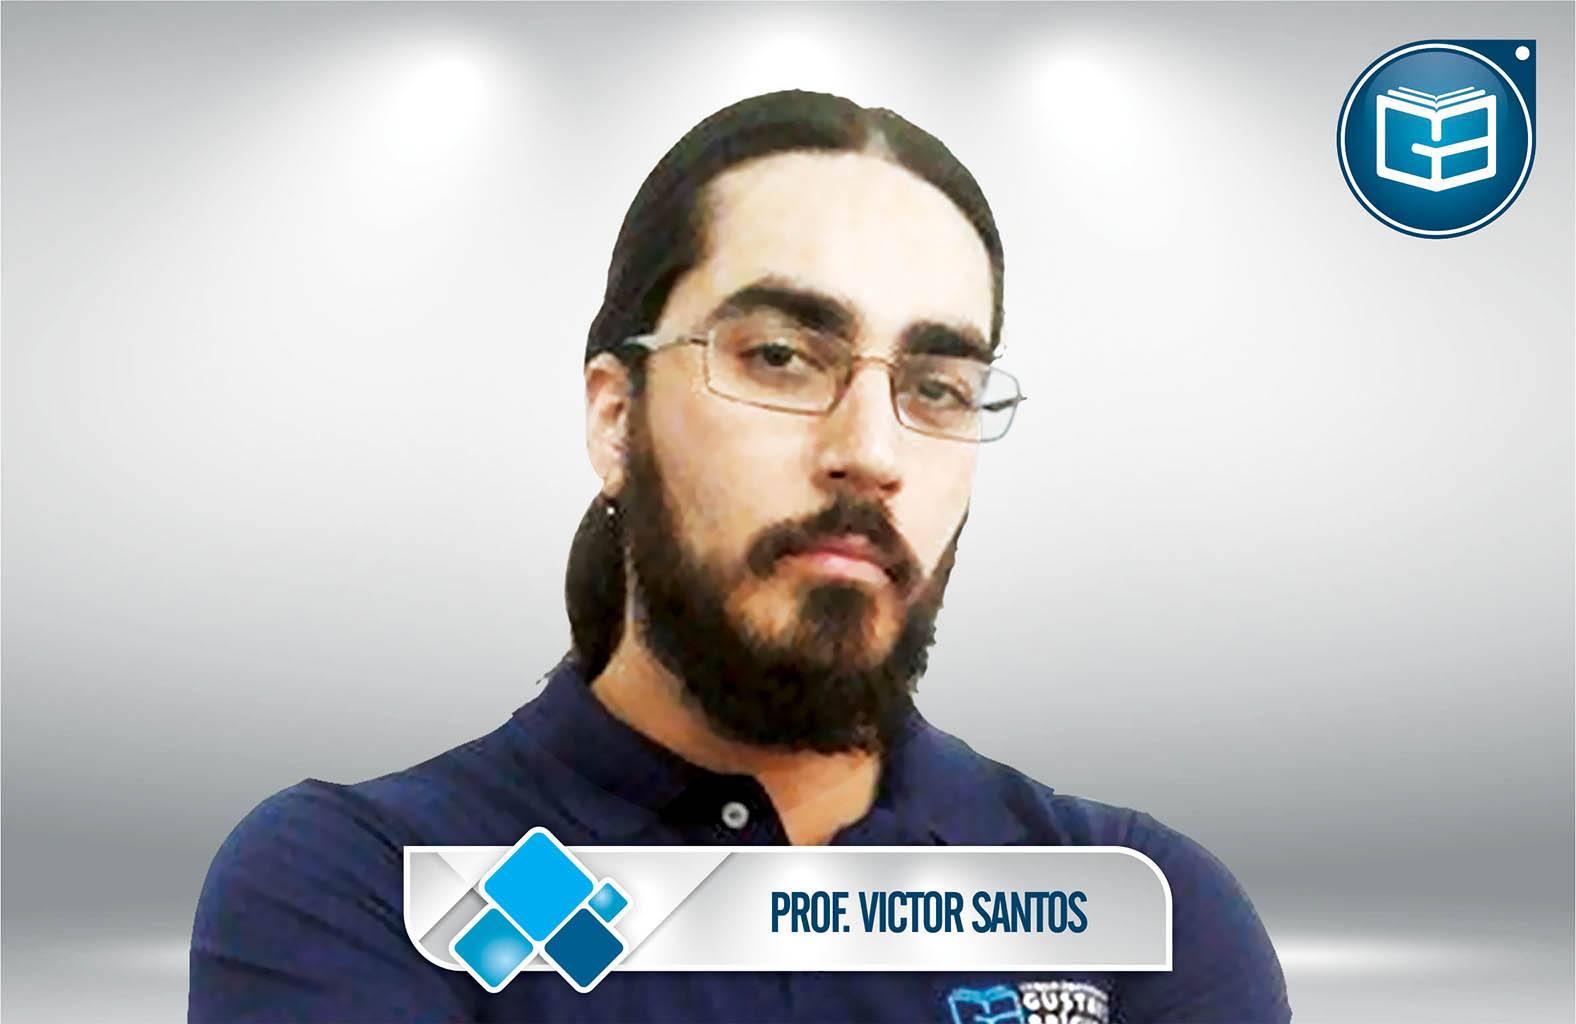 CURSO COMBO OPERACIONAL - PROFESSOR VICTOR SANTOS